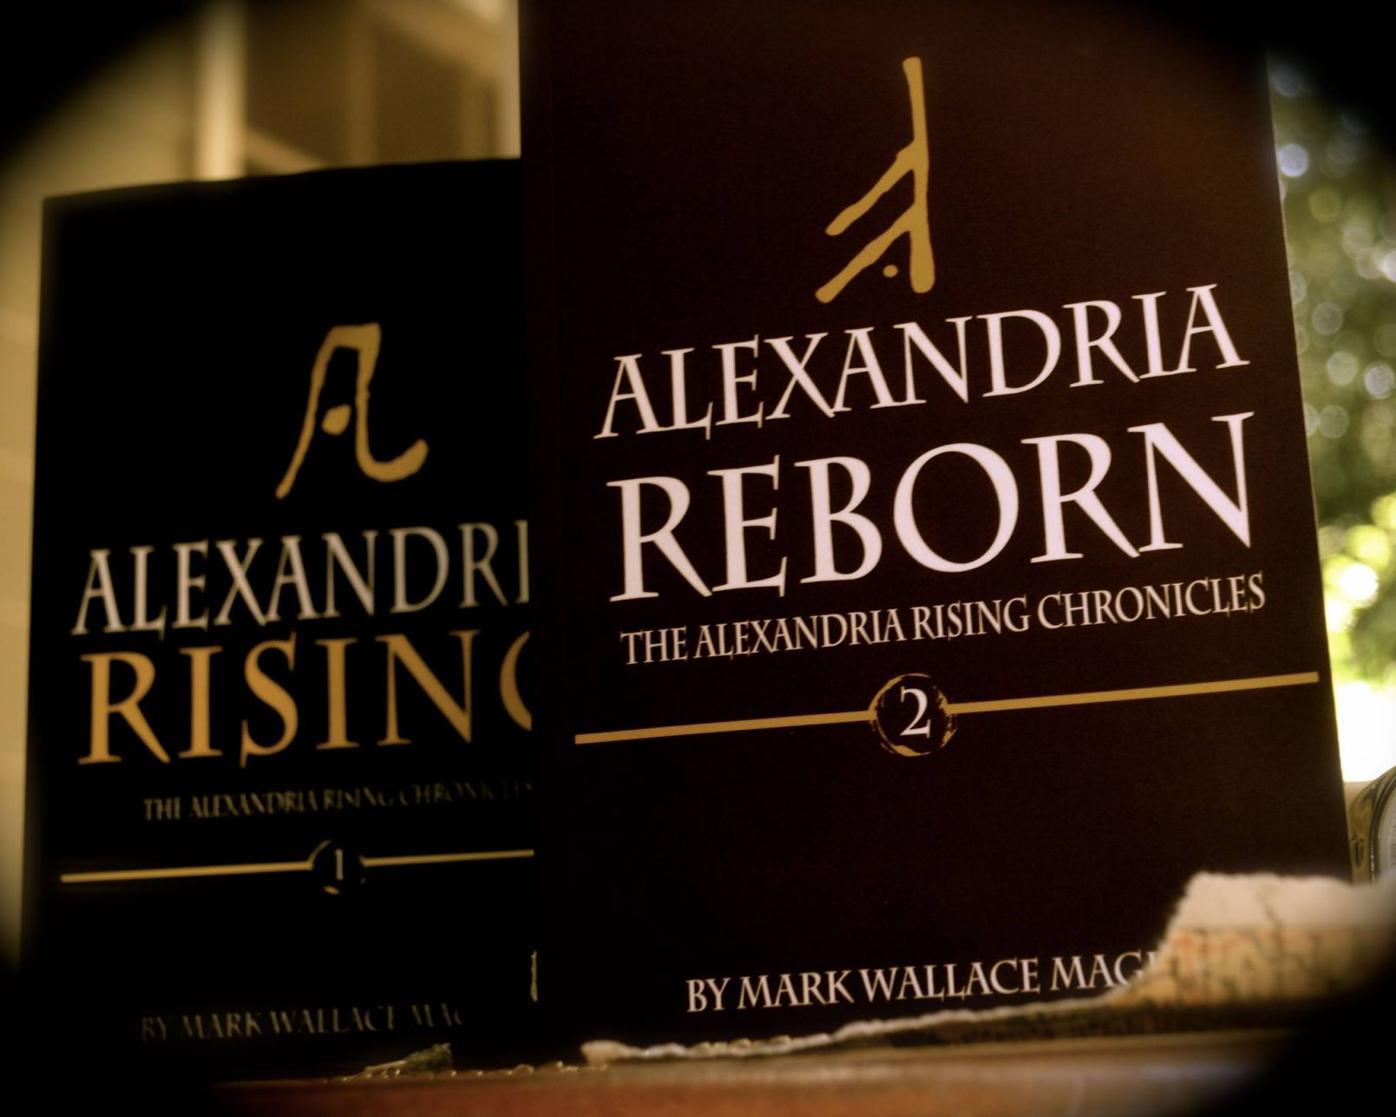 Alexandria Rising Chronicles series - 2